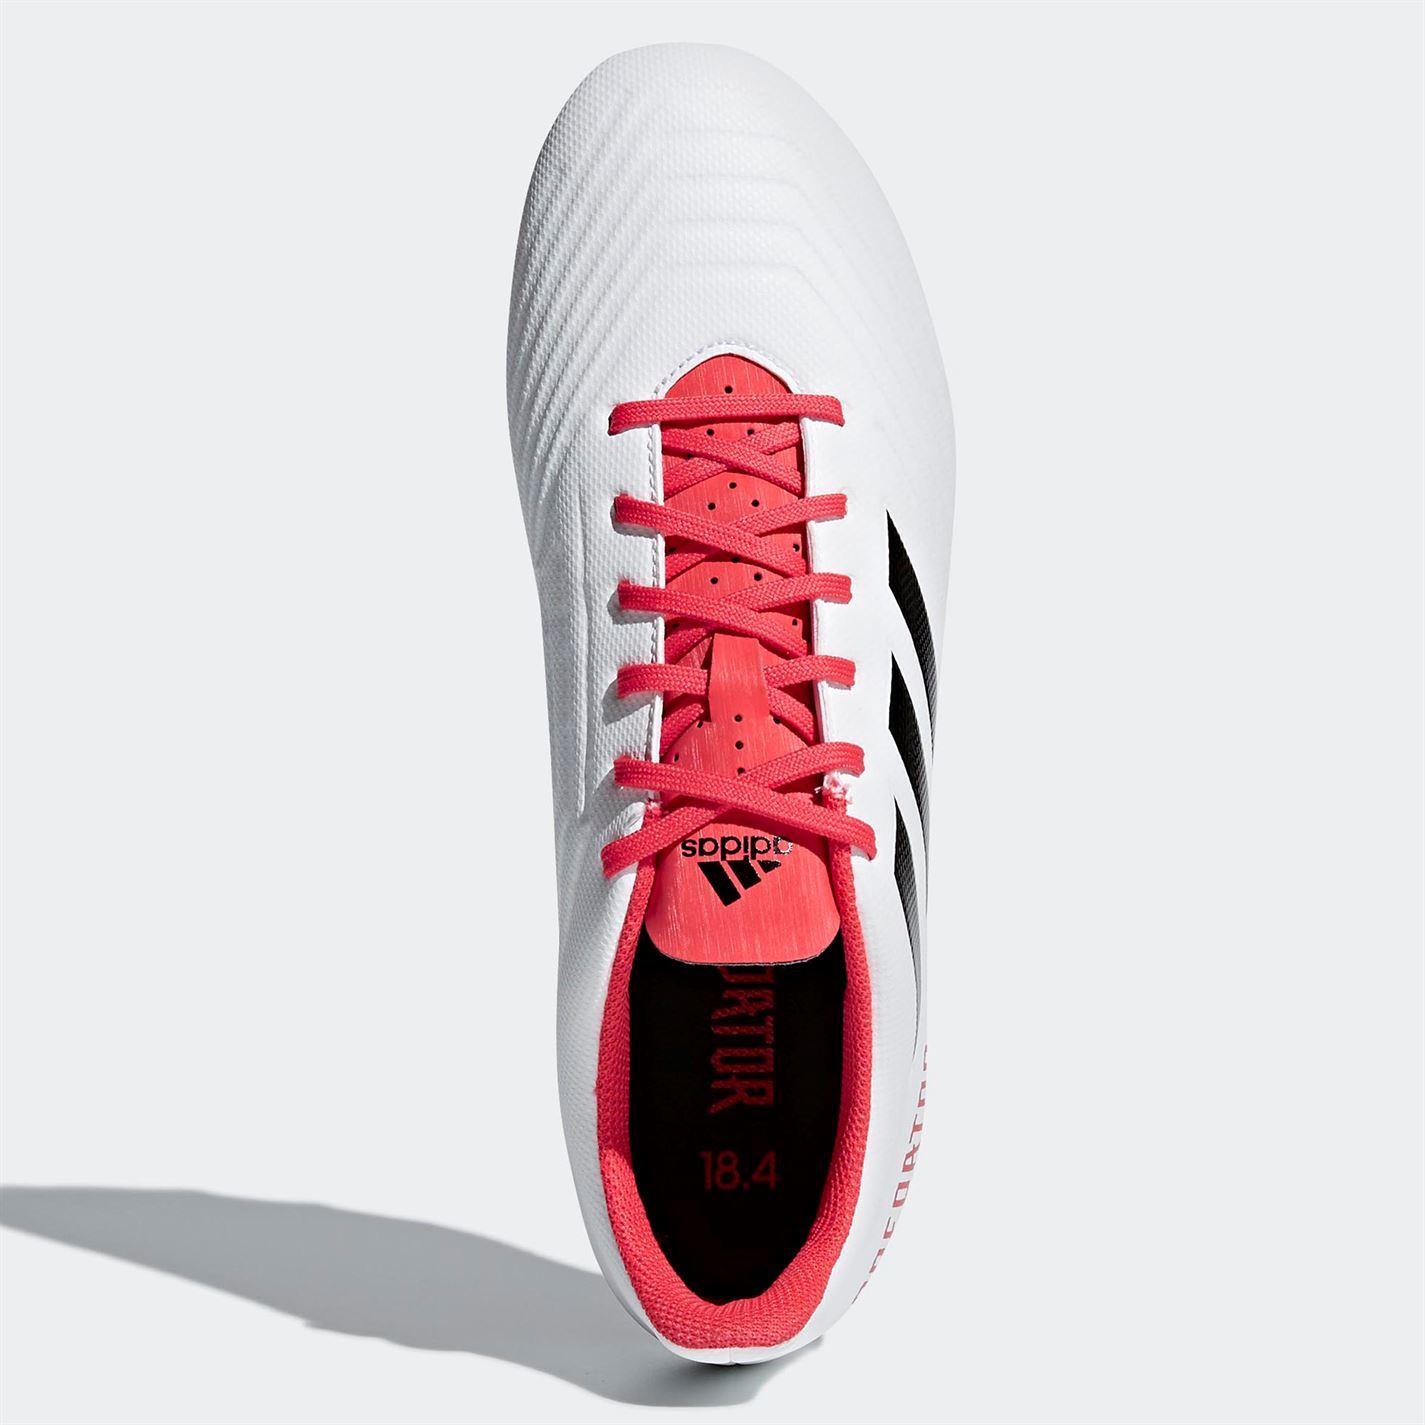 2d5c06c4b180d ... Adidas Predator 1 8.4 firma tierra fútbol botas para hombre blanco rojo  futbol tacos ...